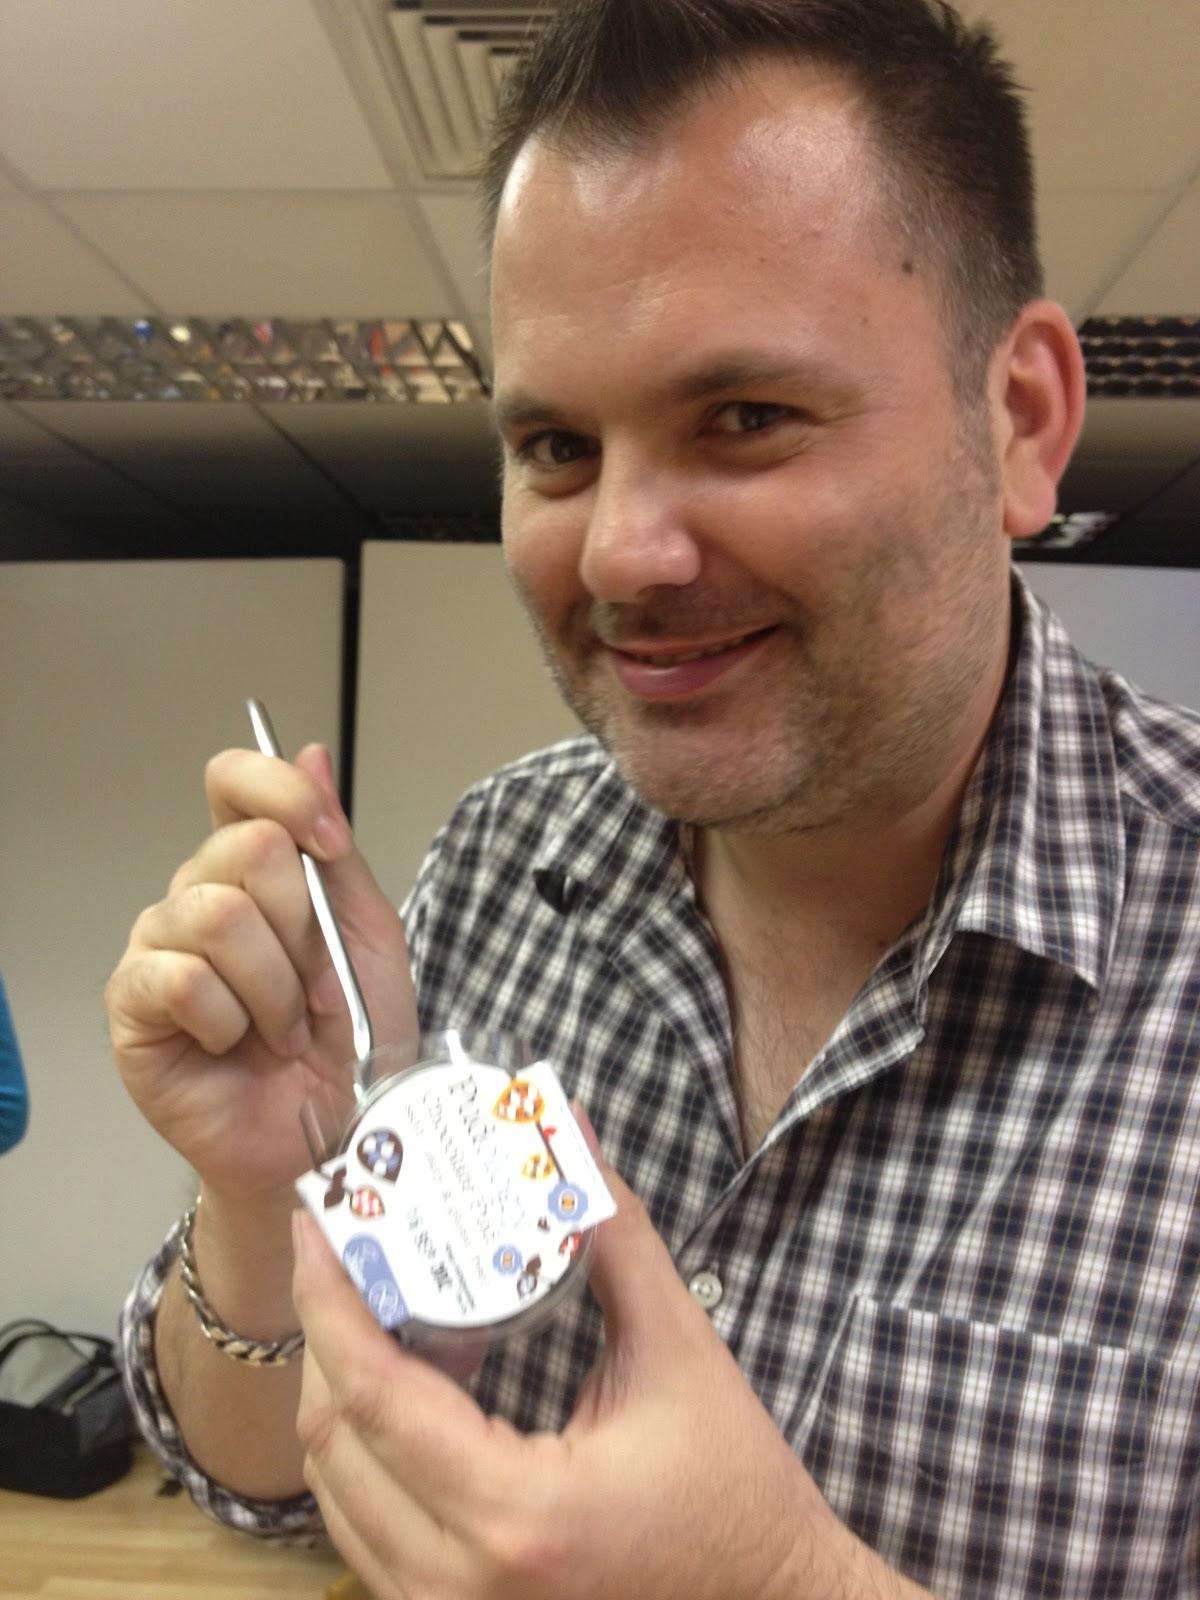 http://fatgayvegan.com/wp-content/uploads/2012/09/pudding.jpg